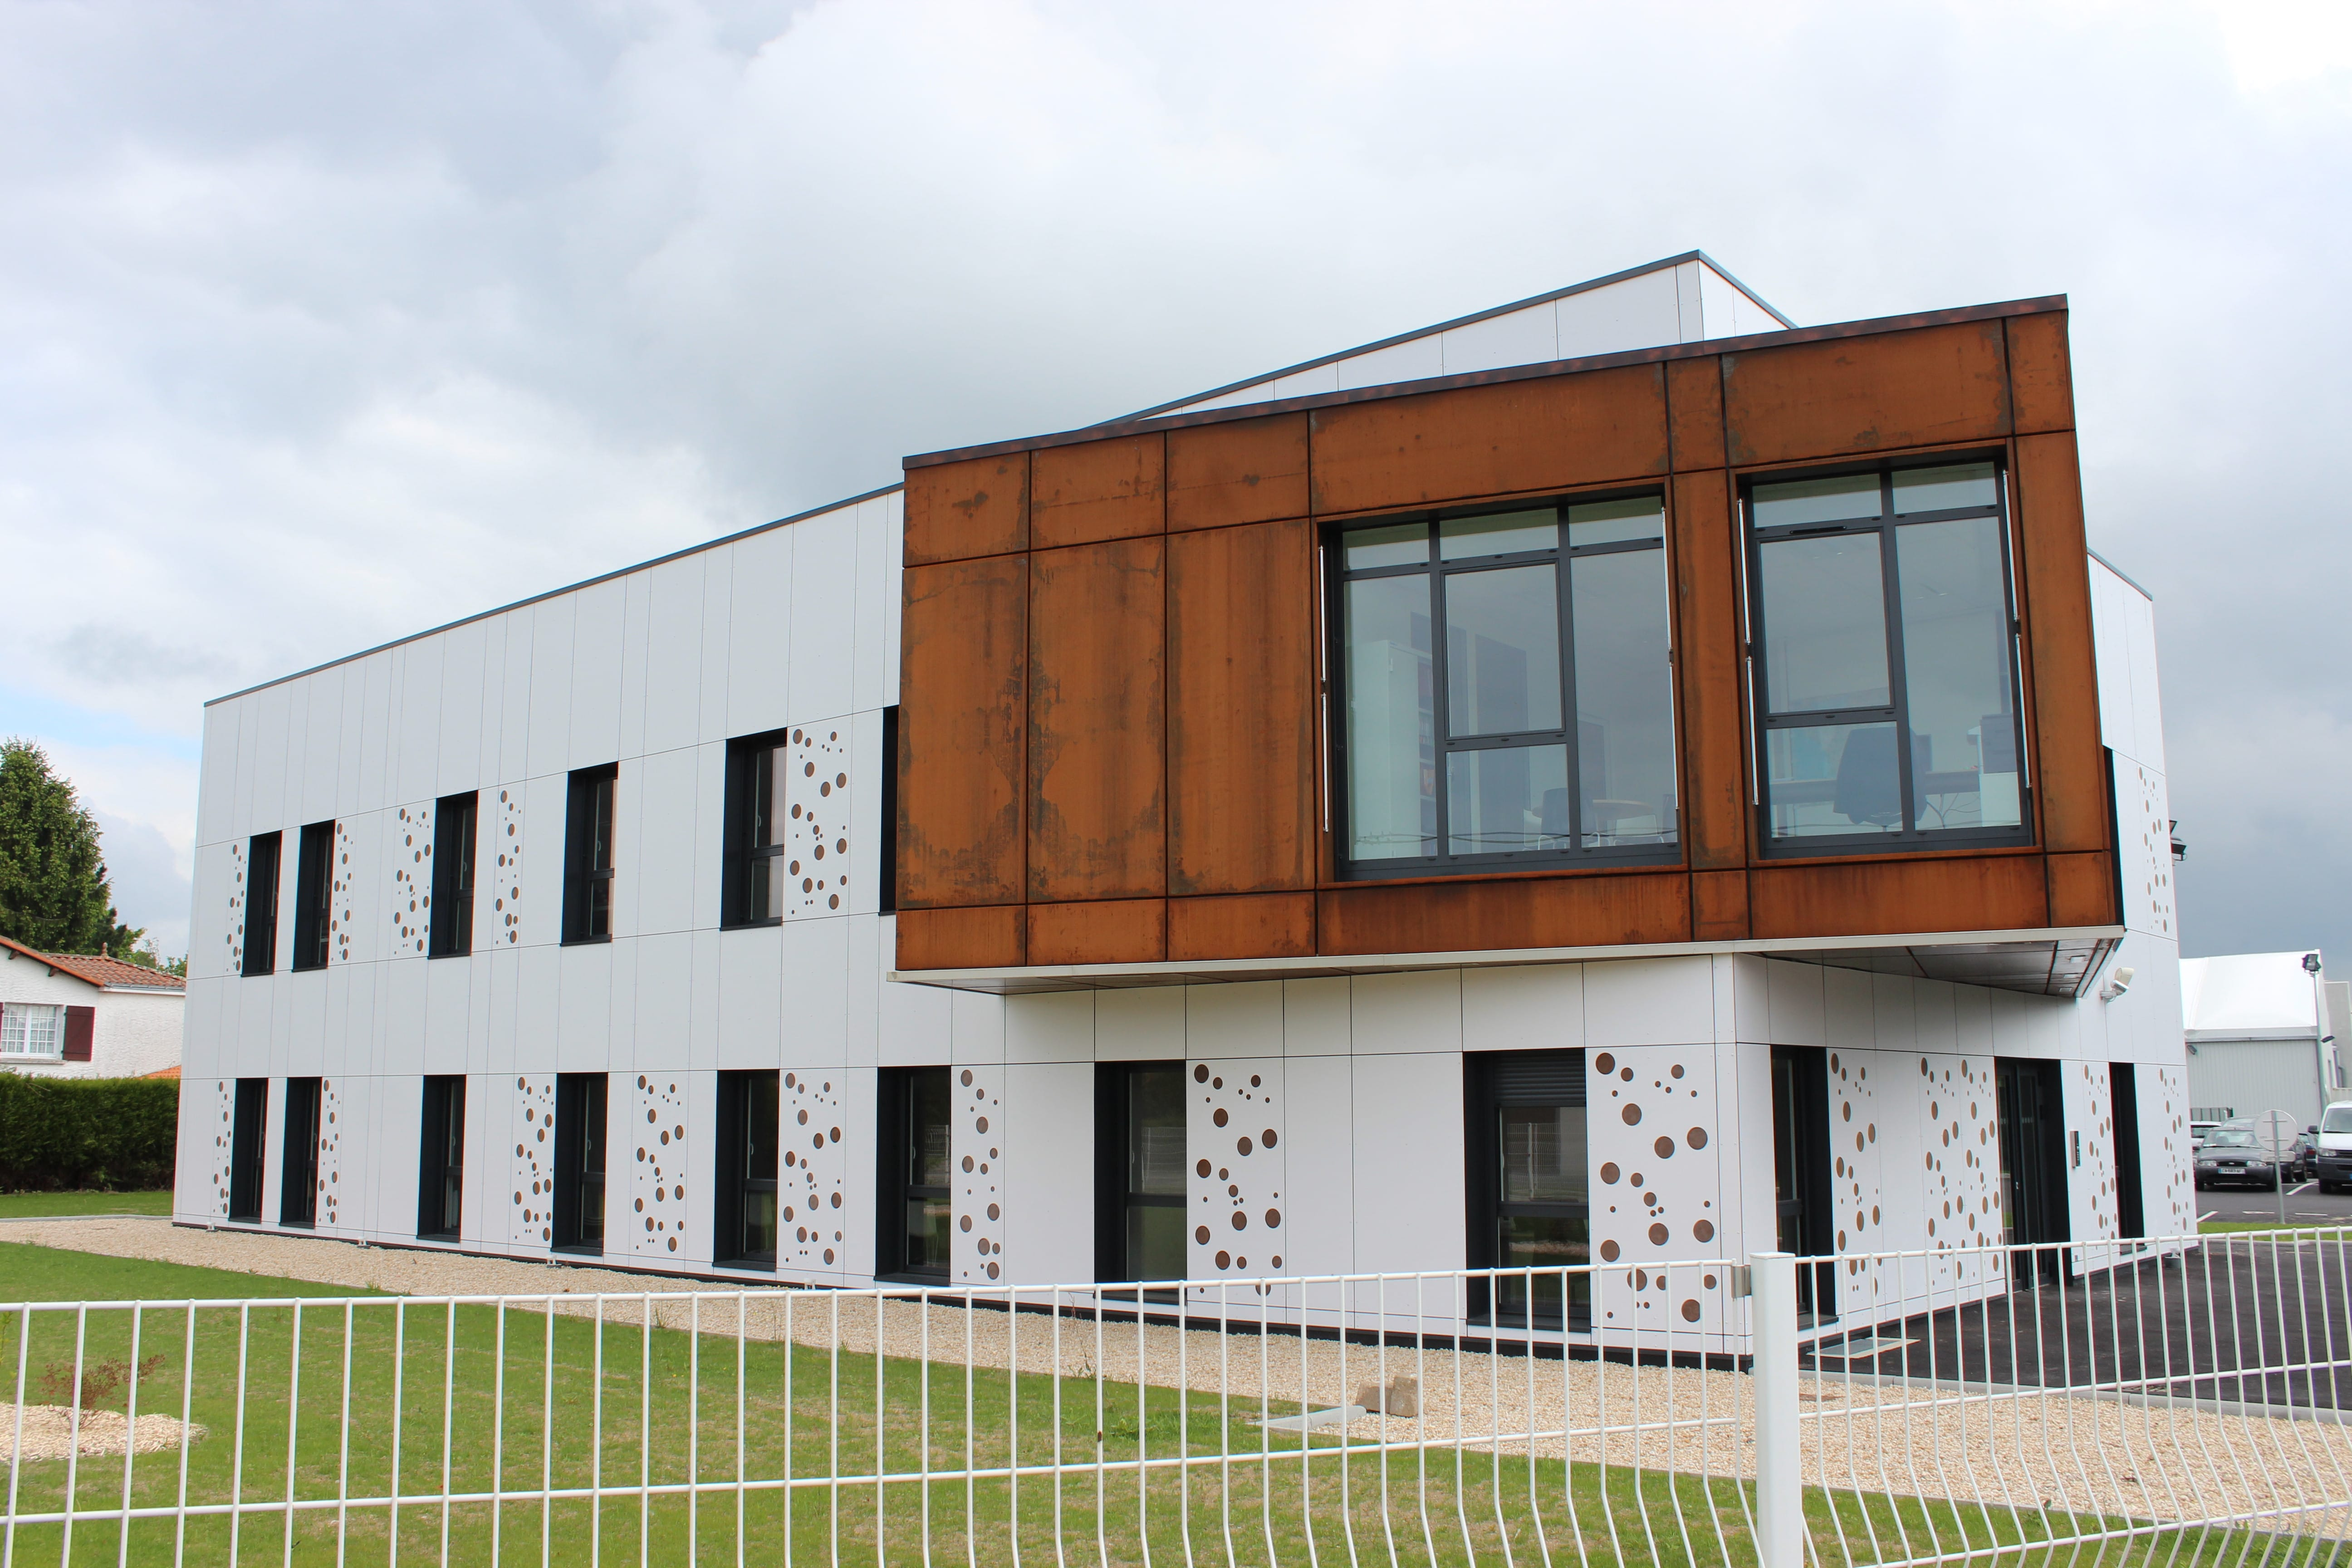 Agence de location modulaire grand ouest cougnaud services for Agence de location